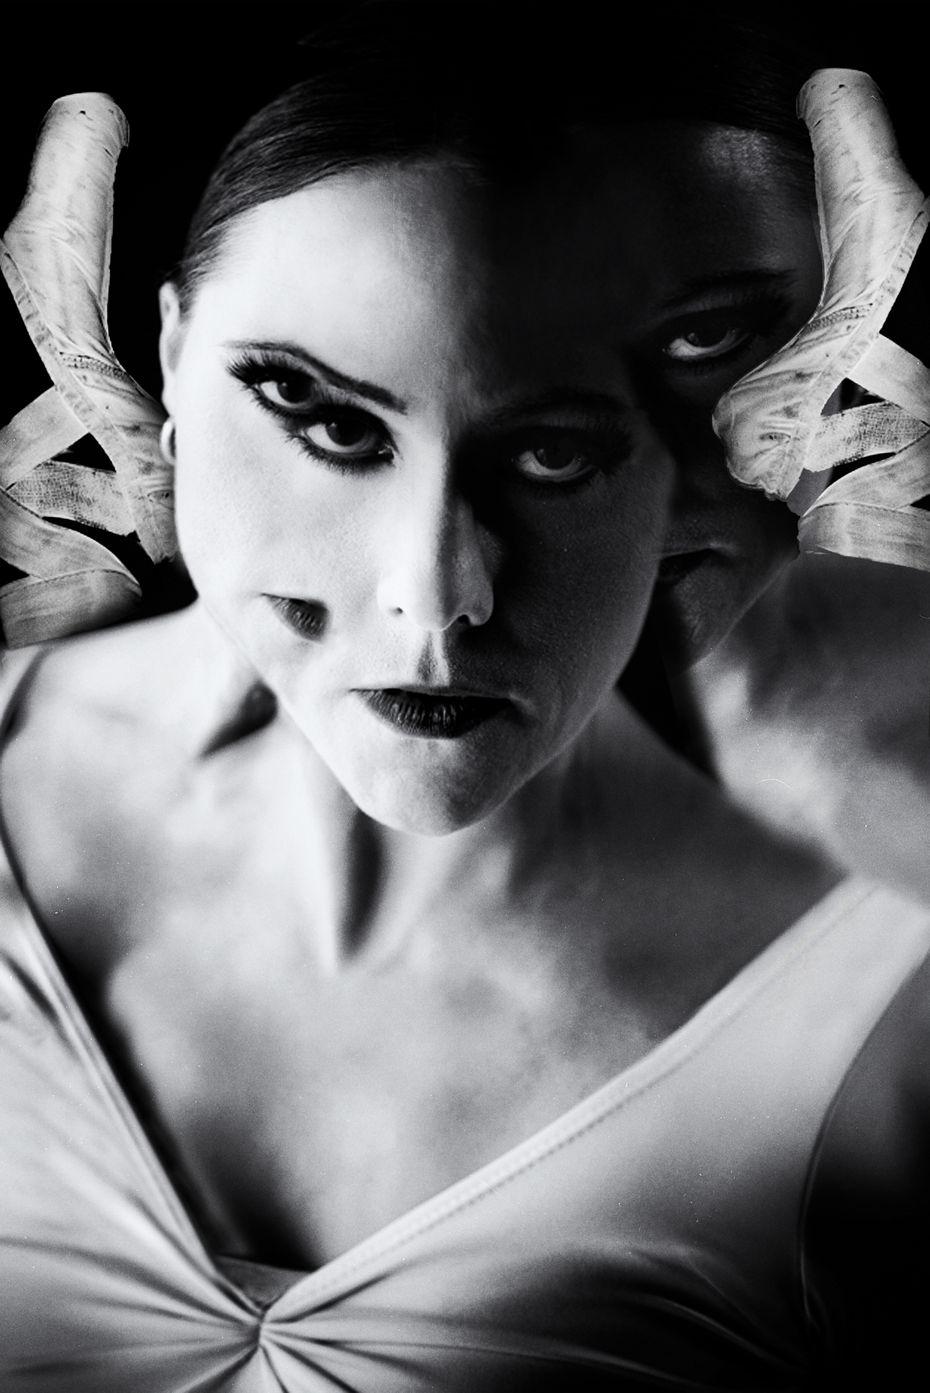 Dancer-choreographer Erin Boone's surreal look.